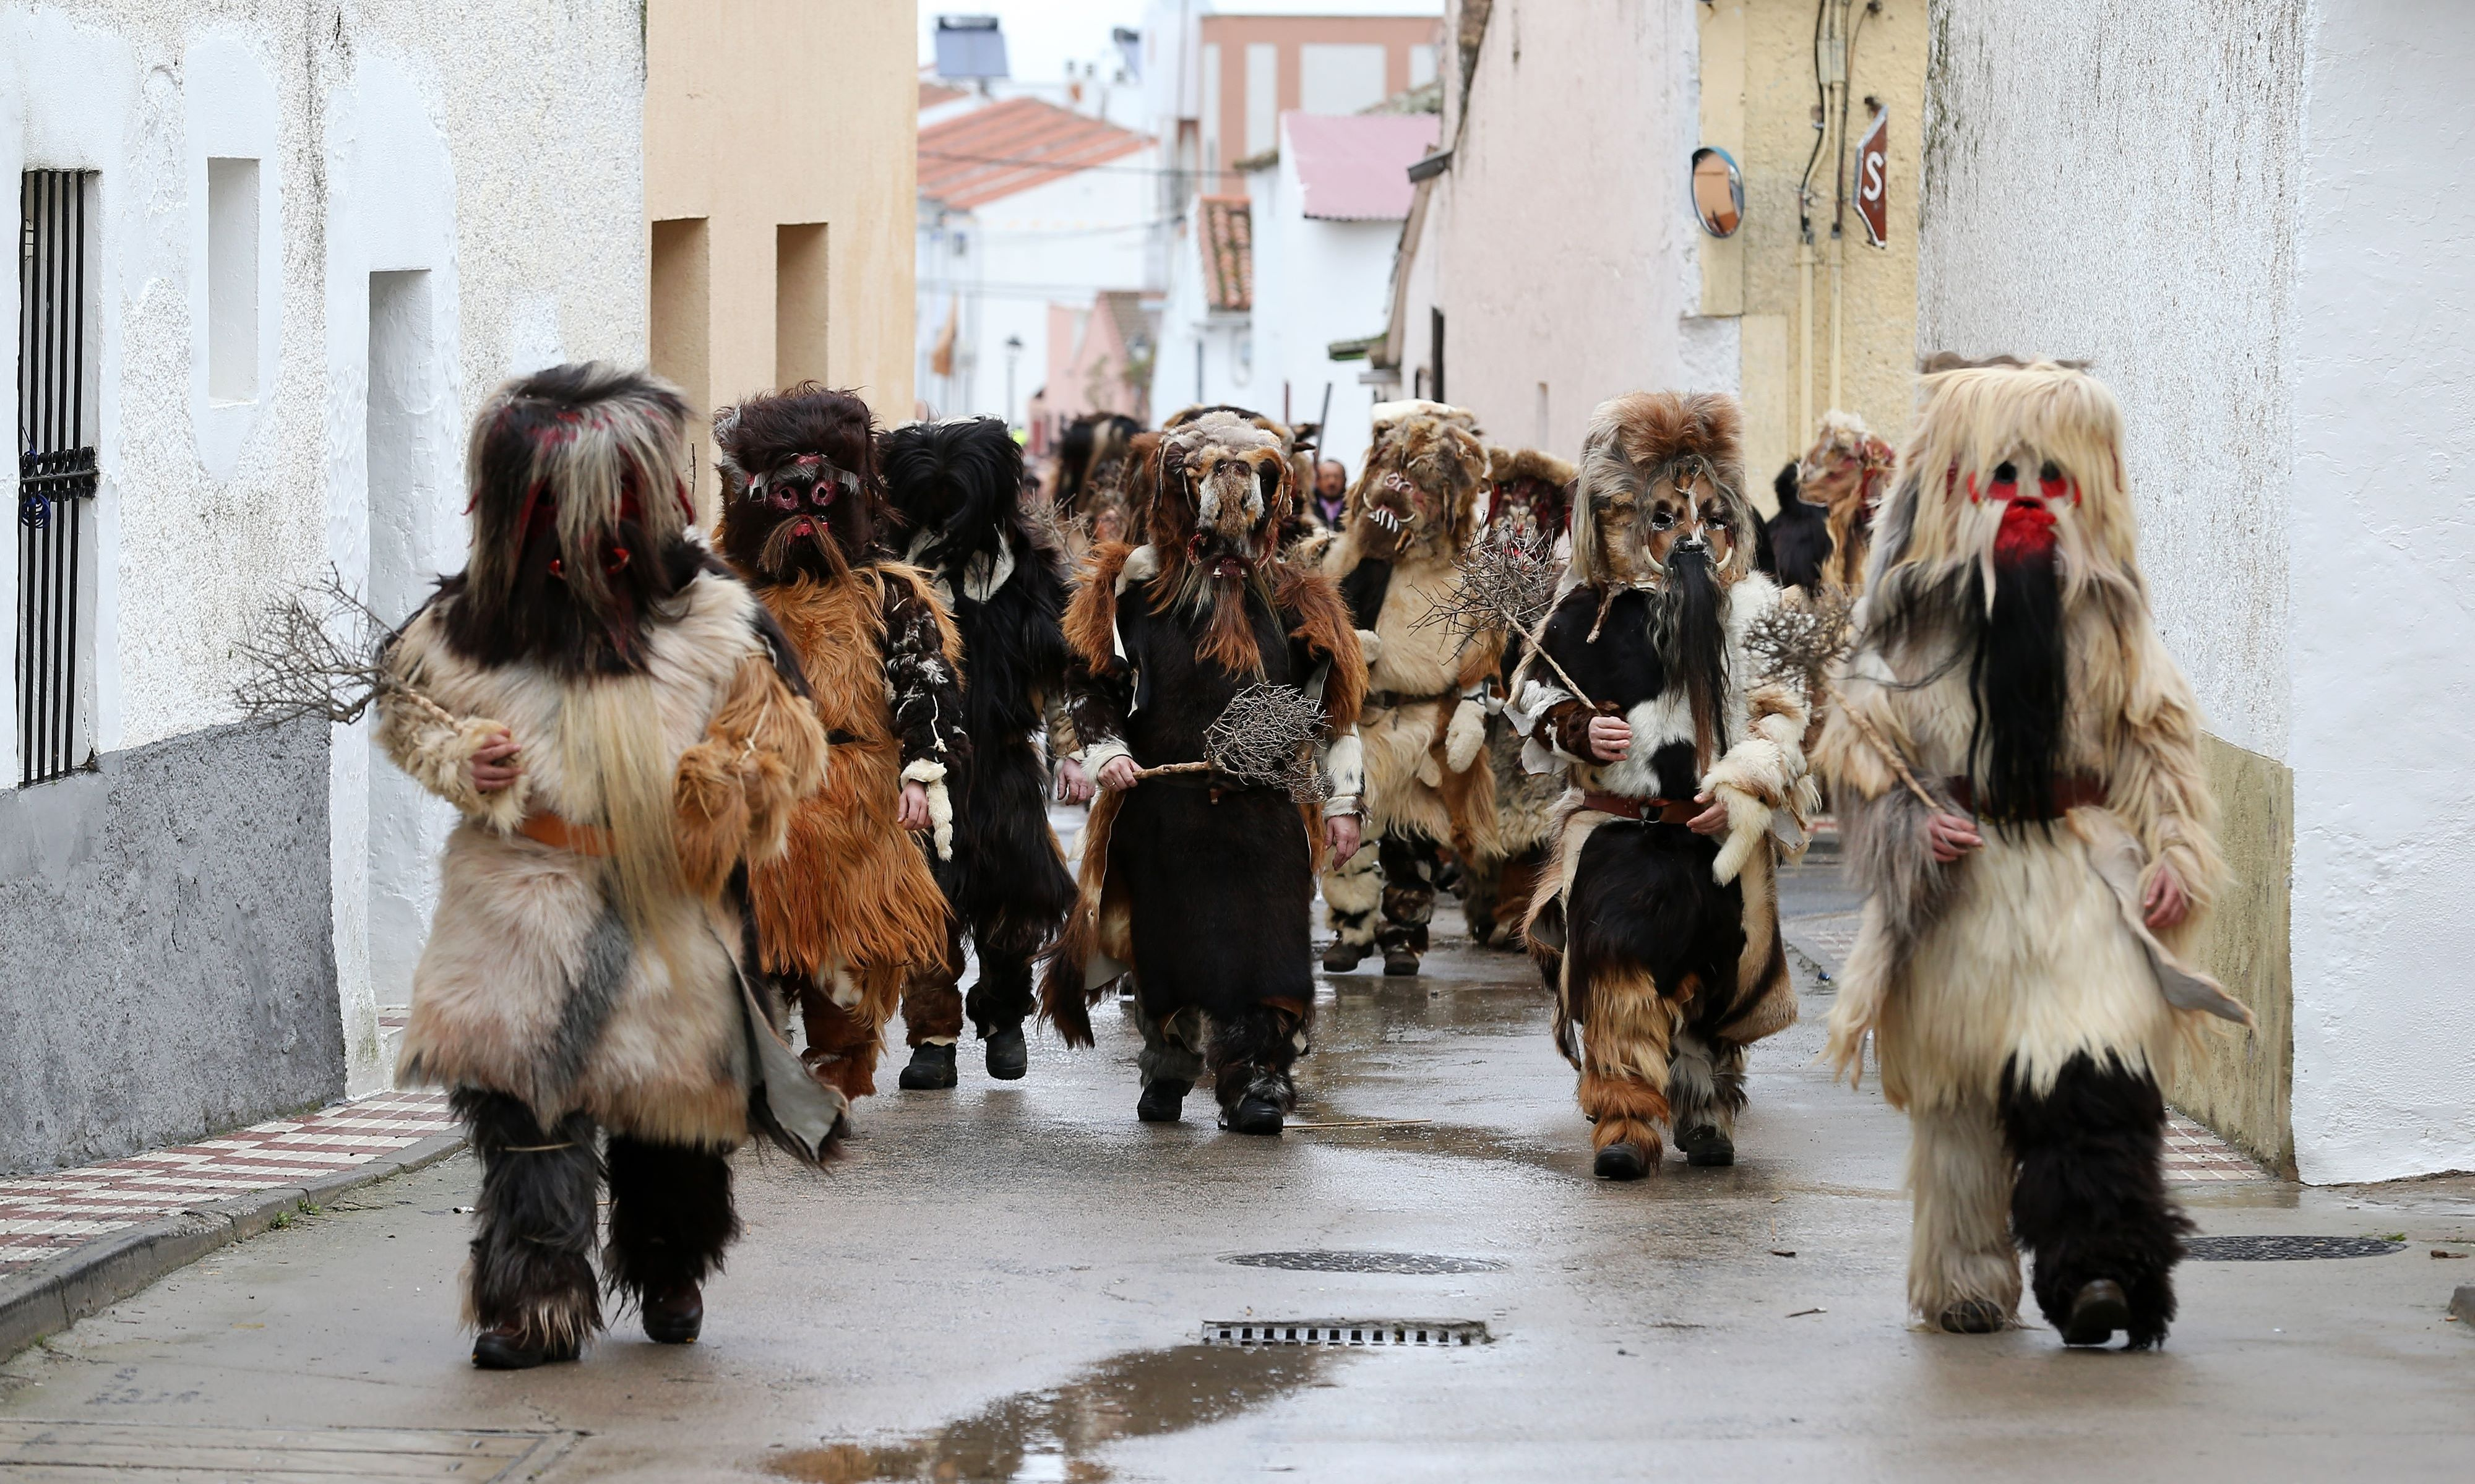 Spain celebrates Saint Sebastian's feast day – in pictures